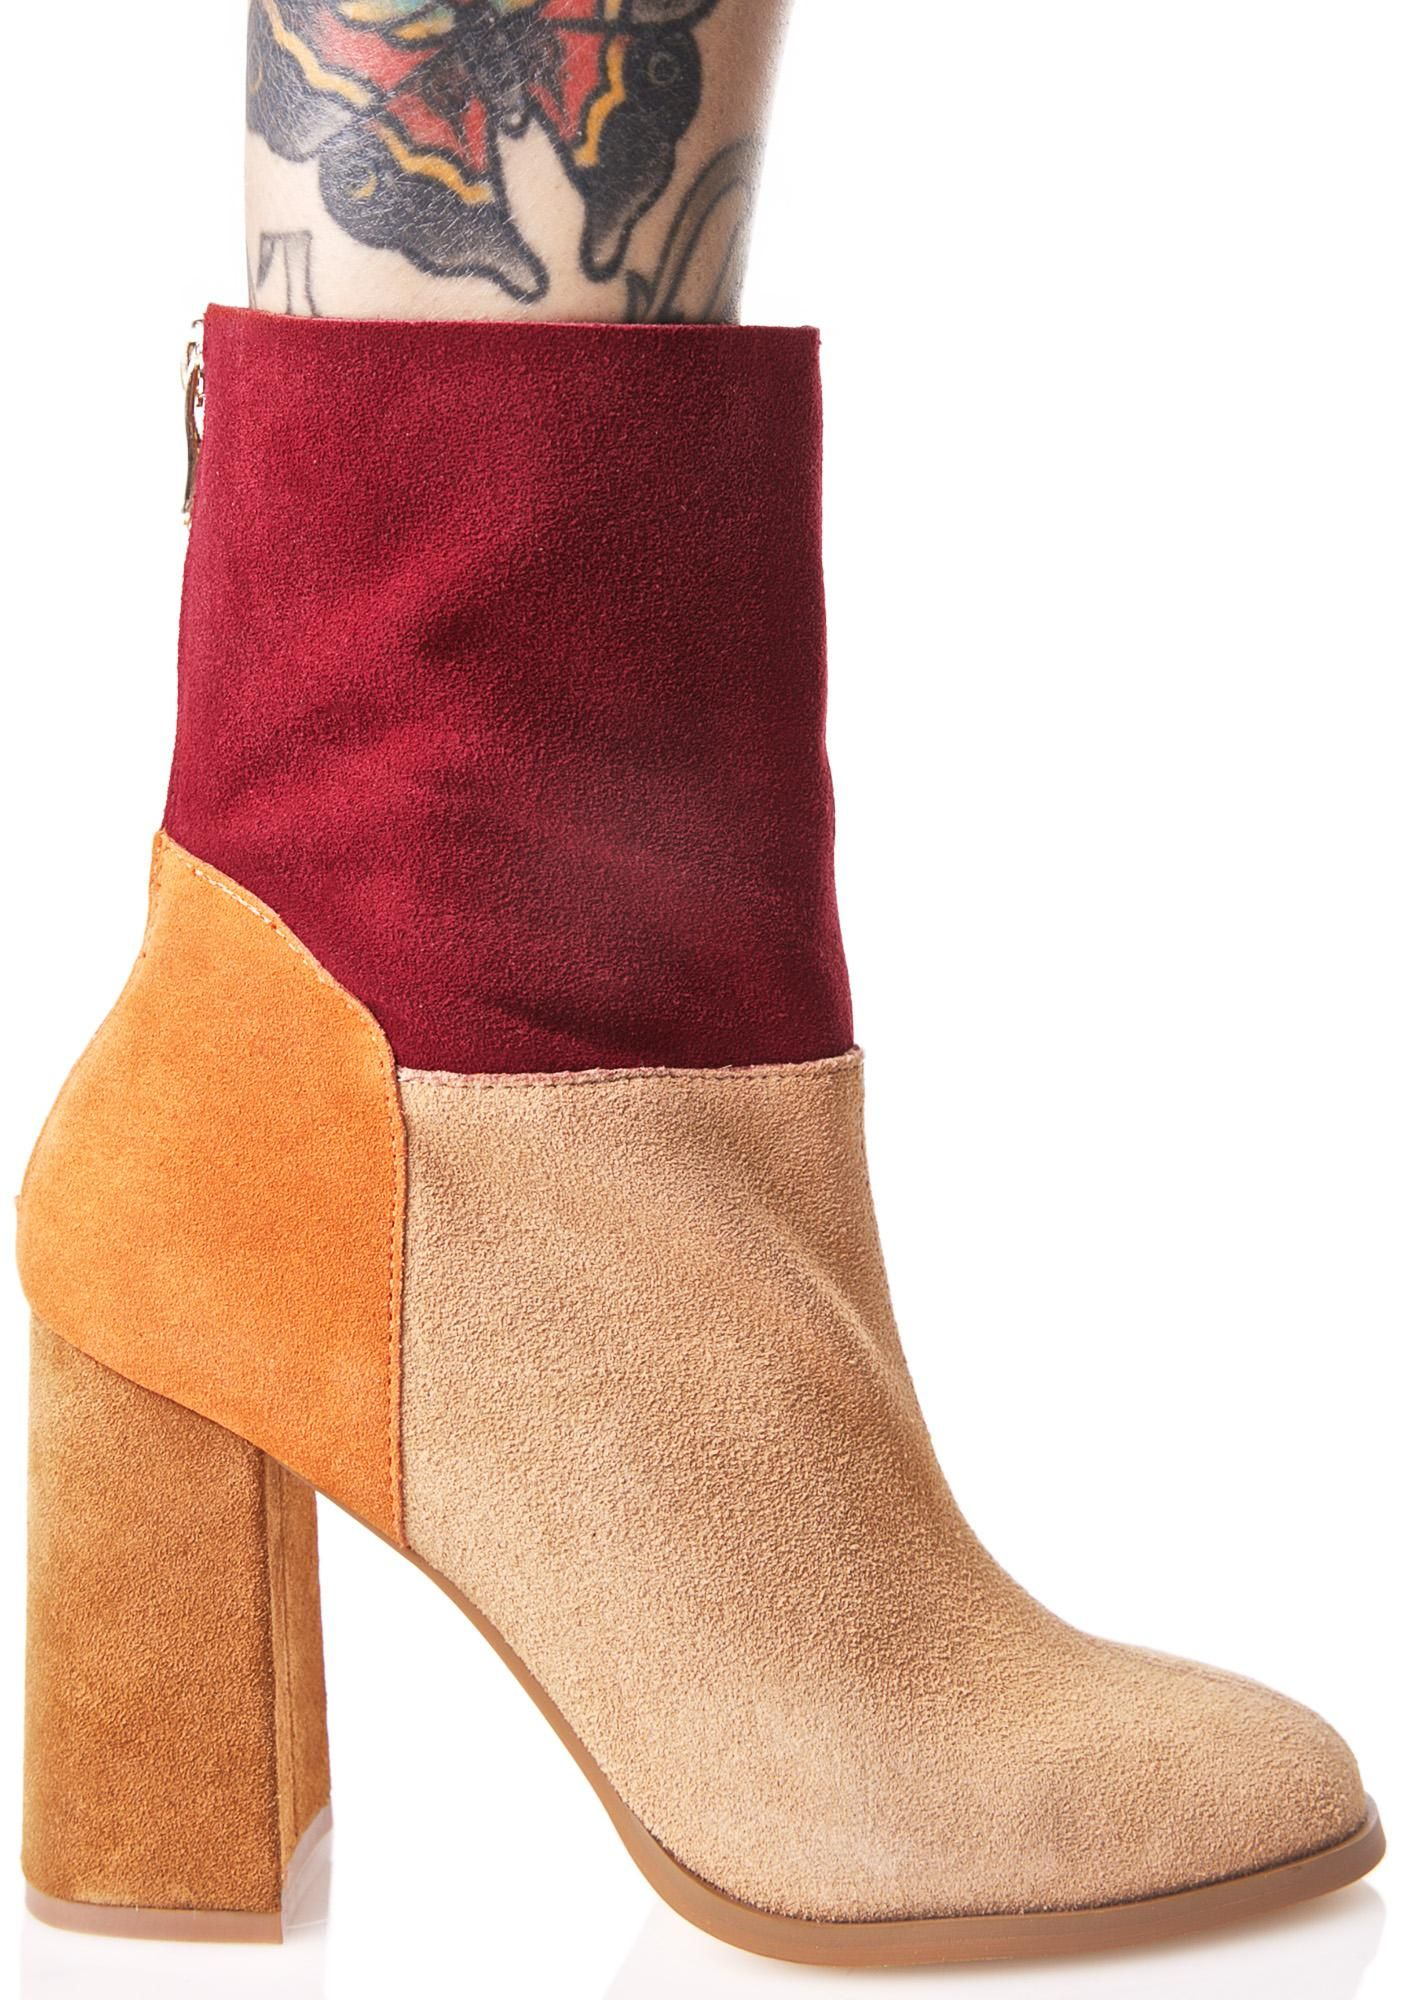 Rumba Suede Boots Boots Suede Boots Block Heel Boots